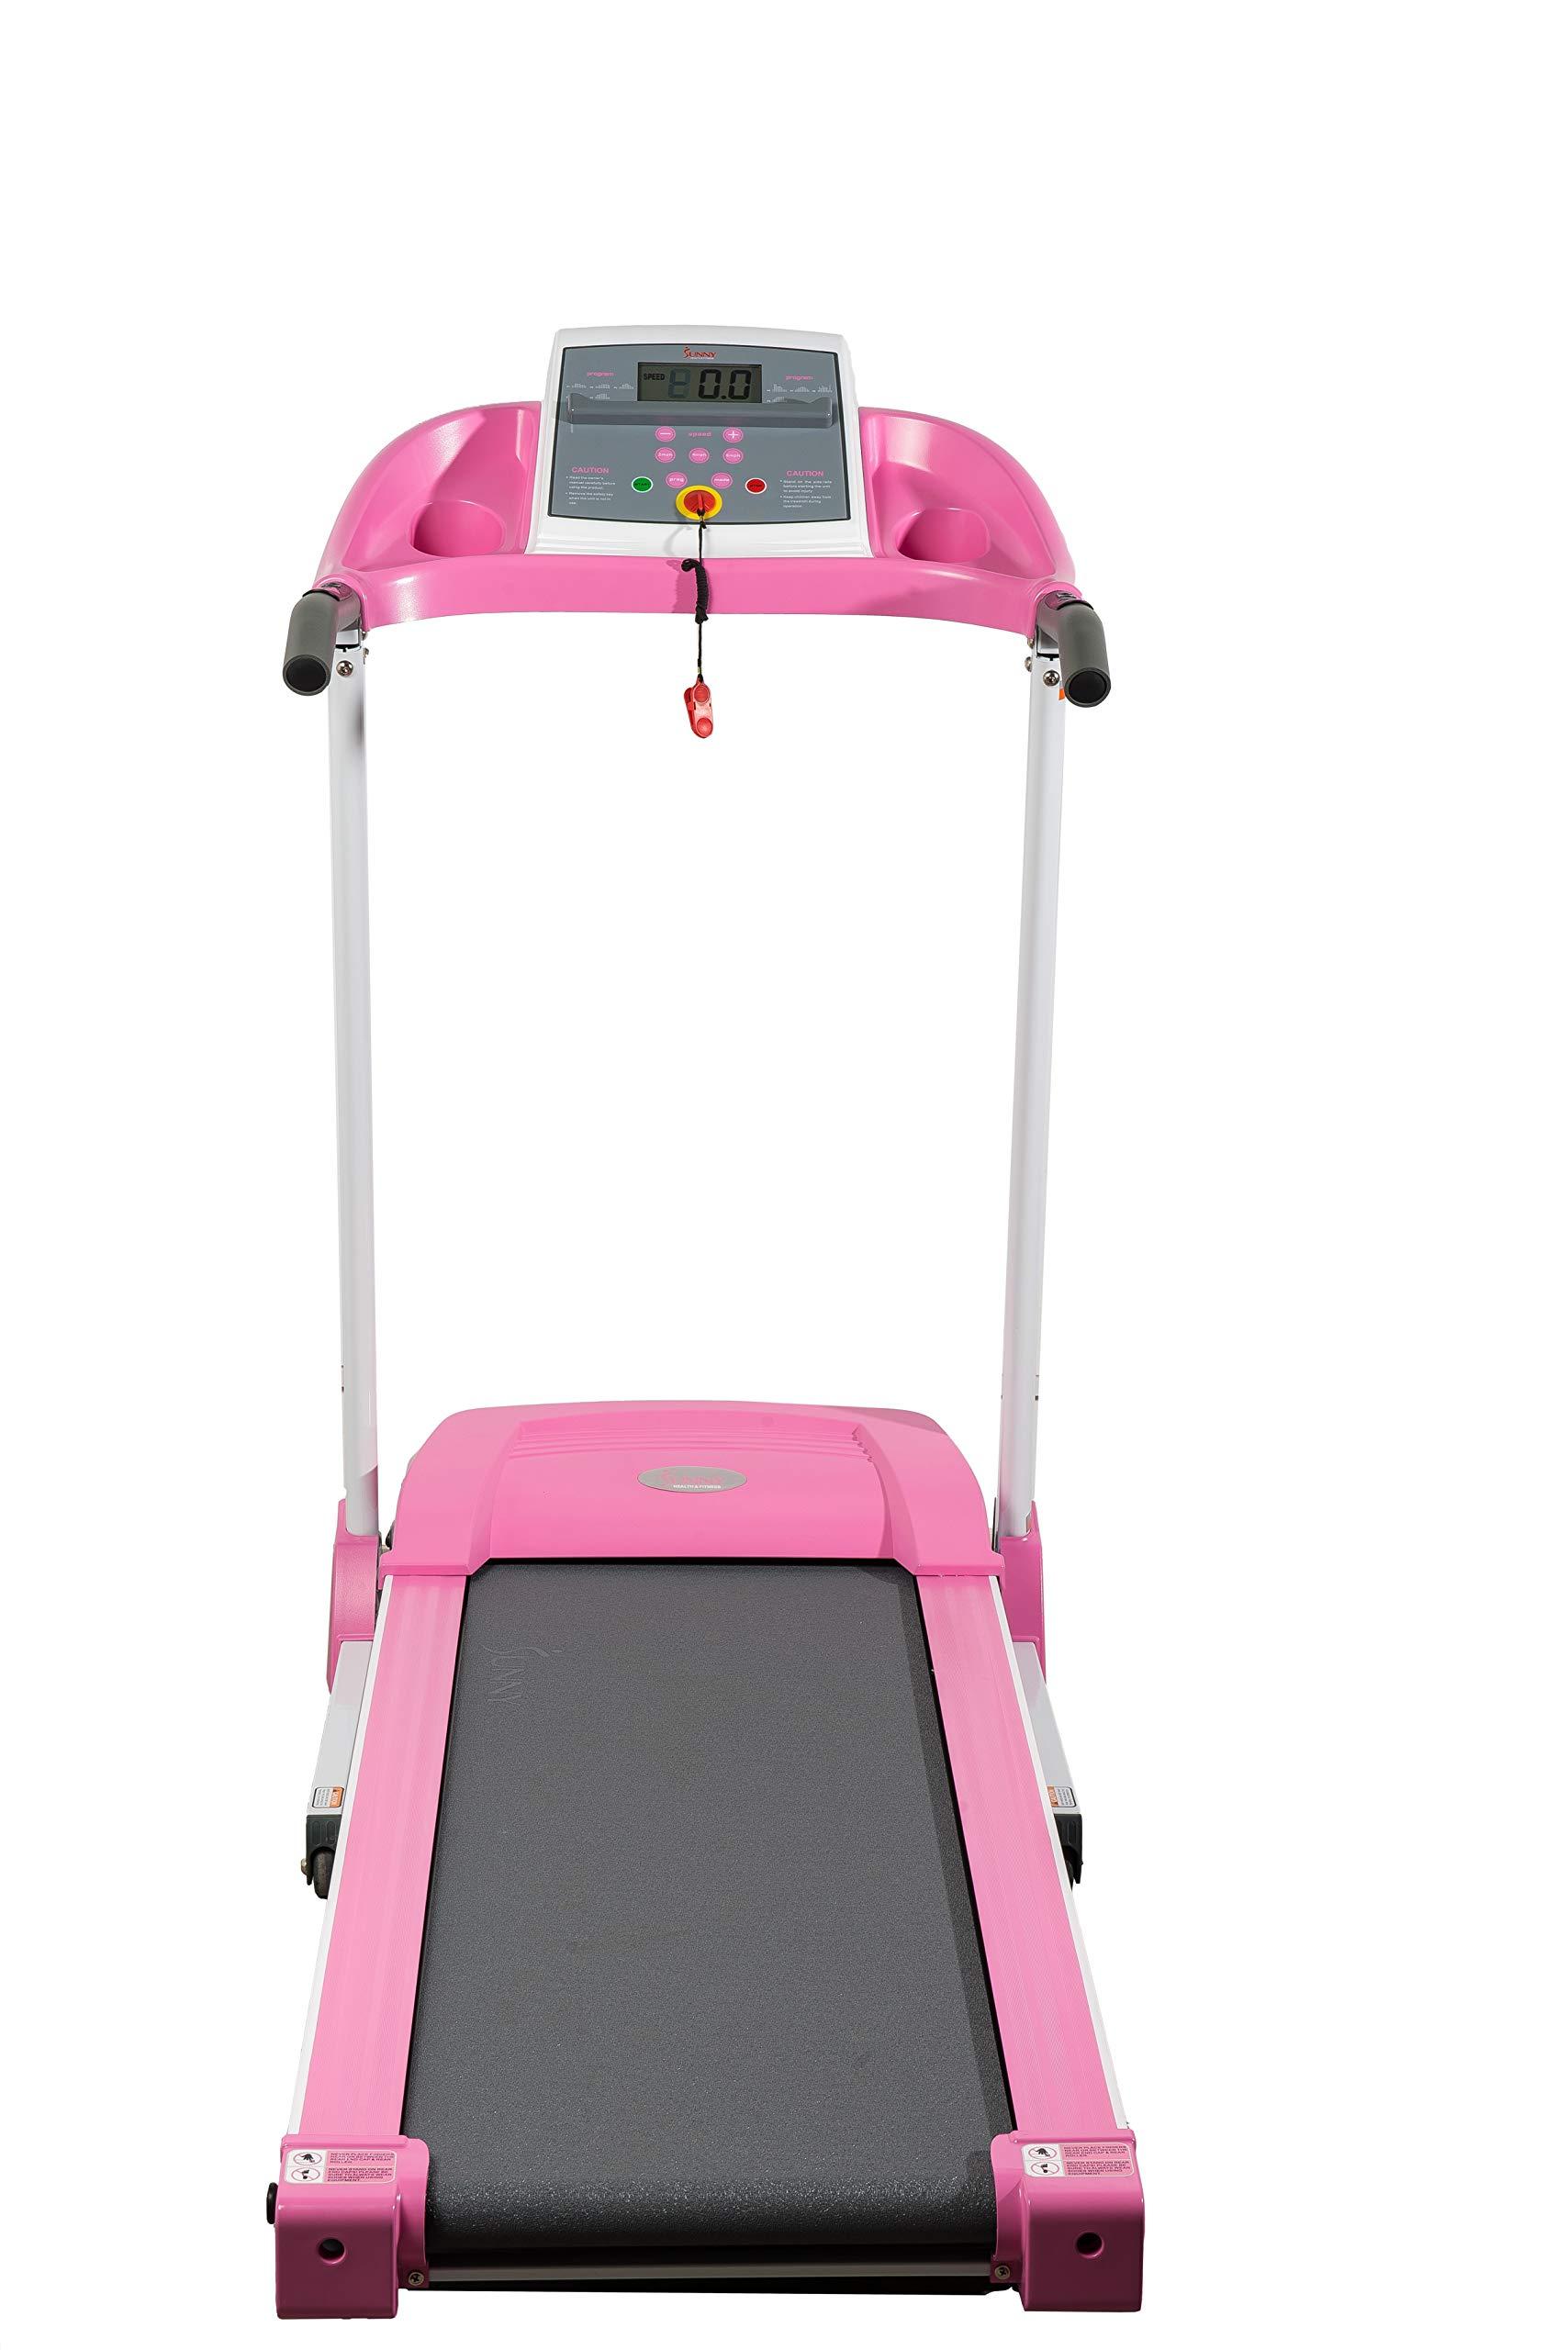 Sunny Health & Fitness P8700 Pink Treadmill by Sunny Health & Fitness (Image #9)